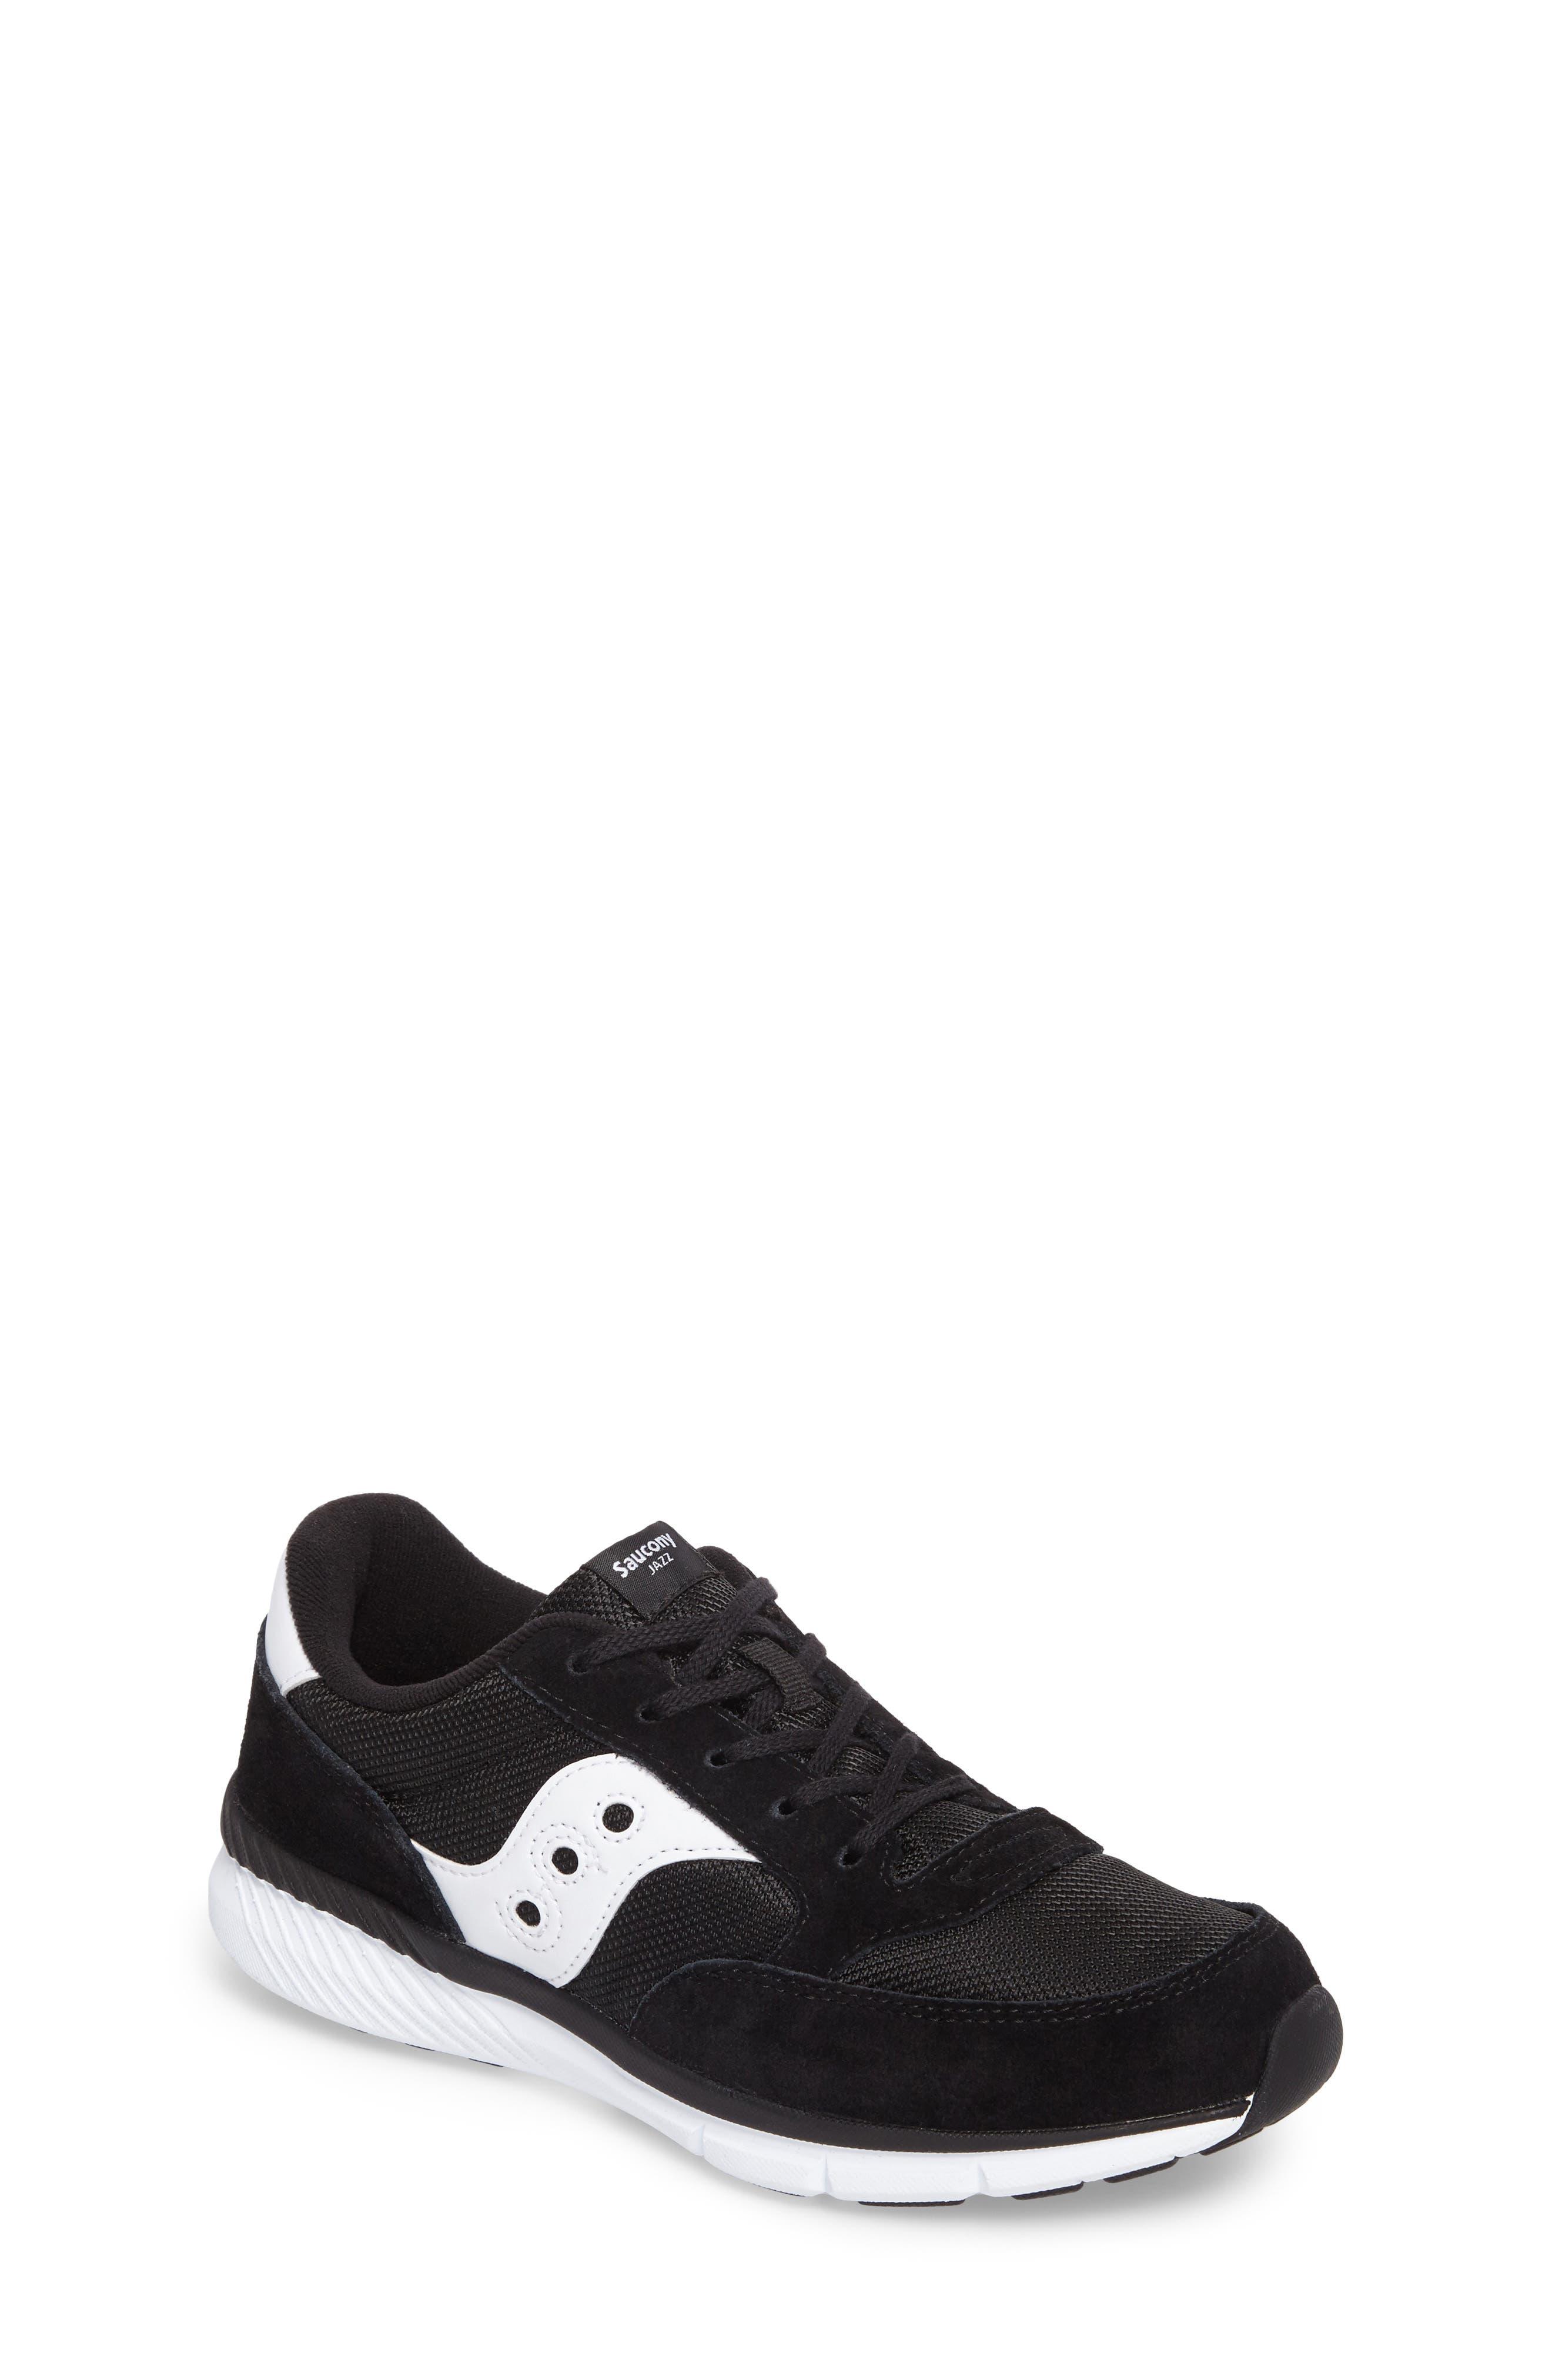 Jazz Lite Athletic Shoe,                             Main thumbnail 1, color,                             Black/ Black